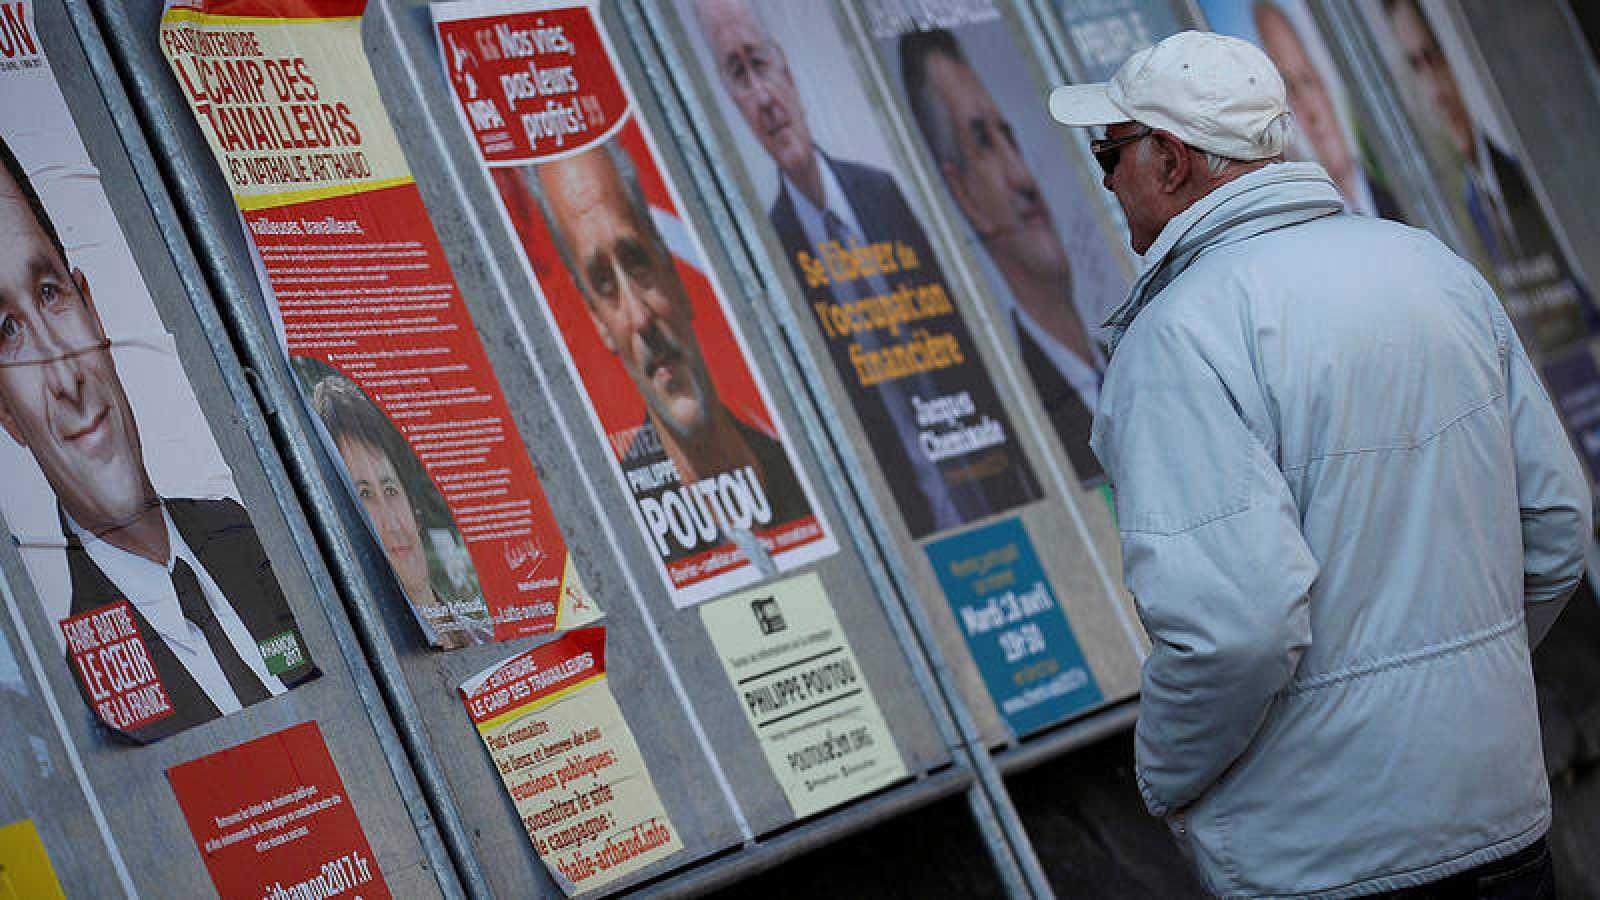 Un hombre pasa junto a carteles electorales en Enghien-les-Bains, cerca de París, Francia